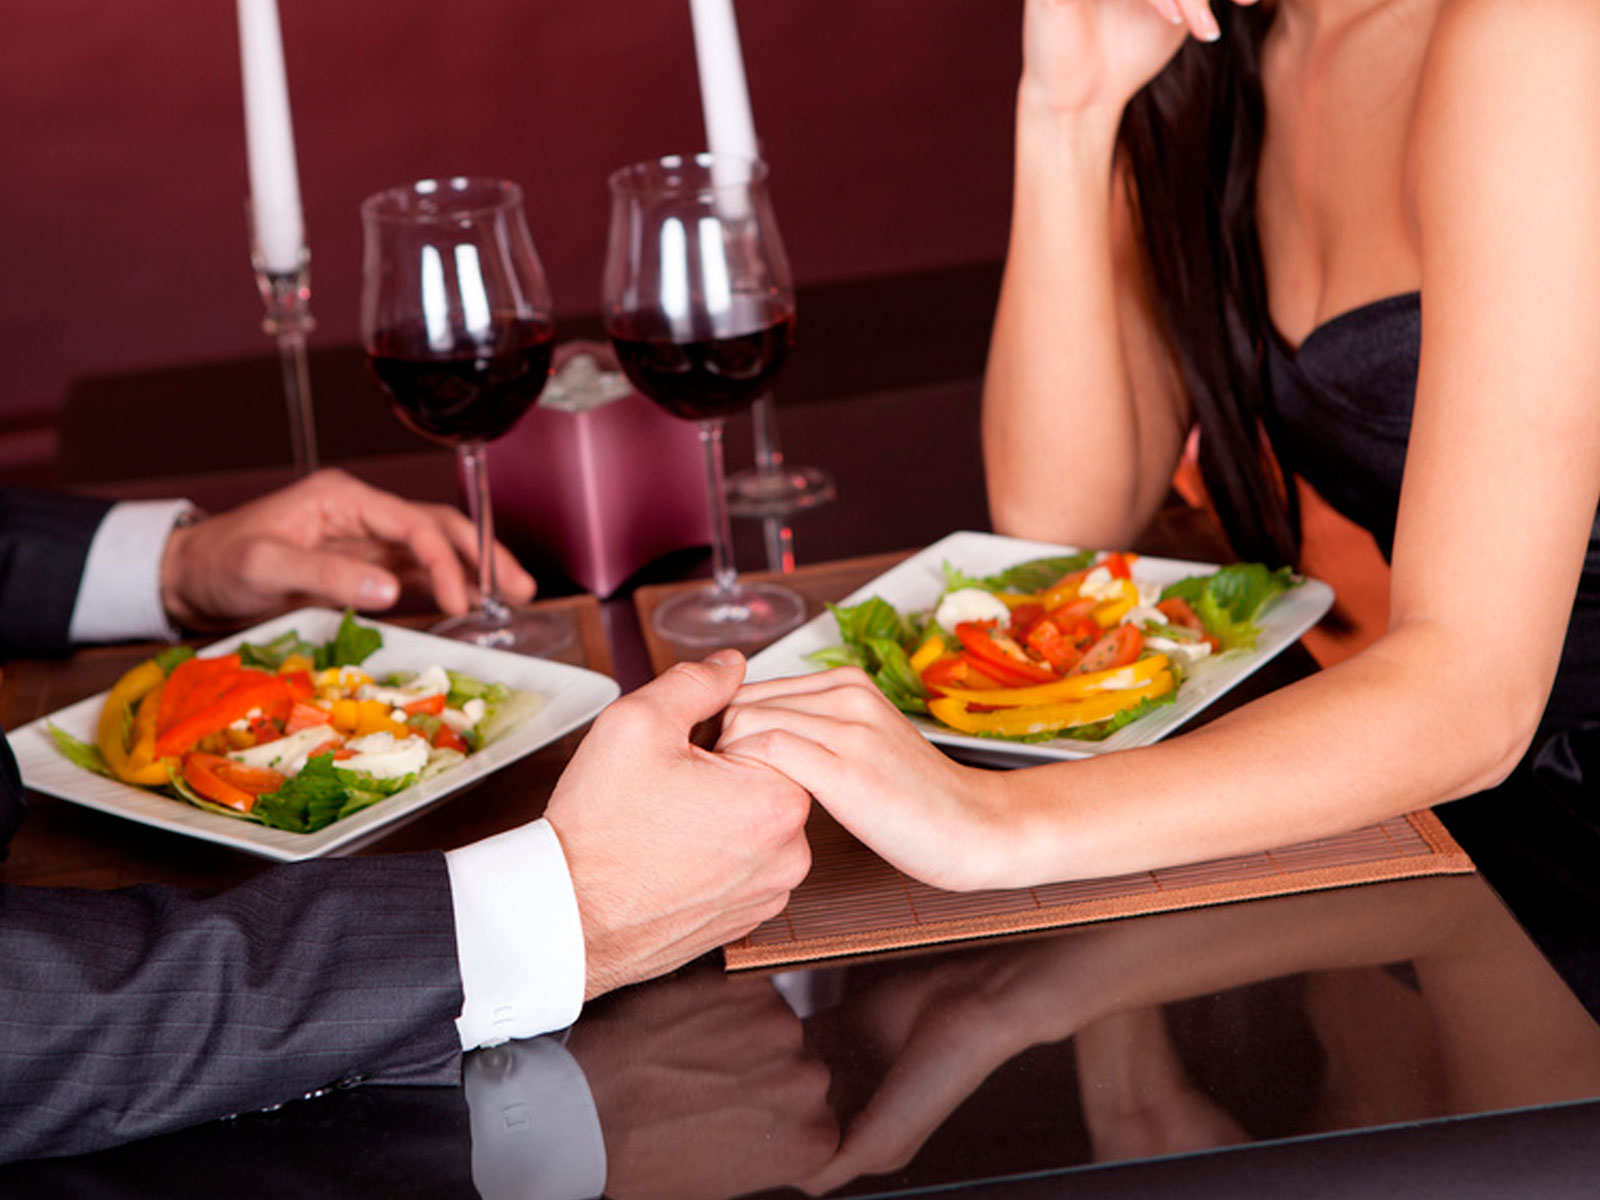 Promotions Hotel Madrid Soho - Vincci Hotels - Romantic Offer